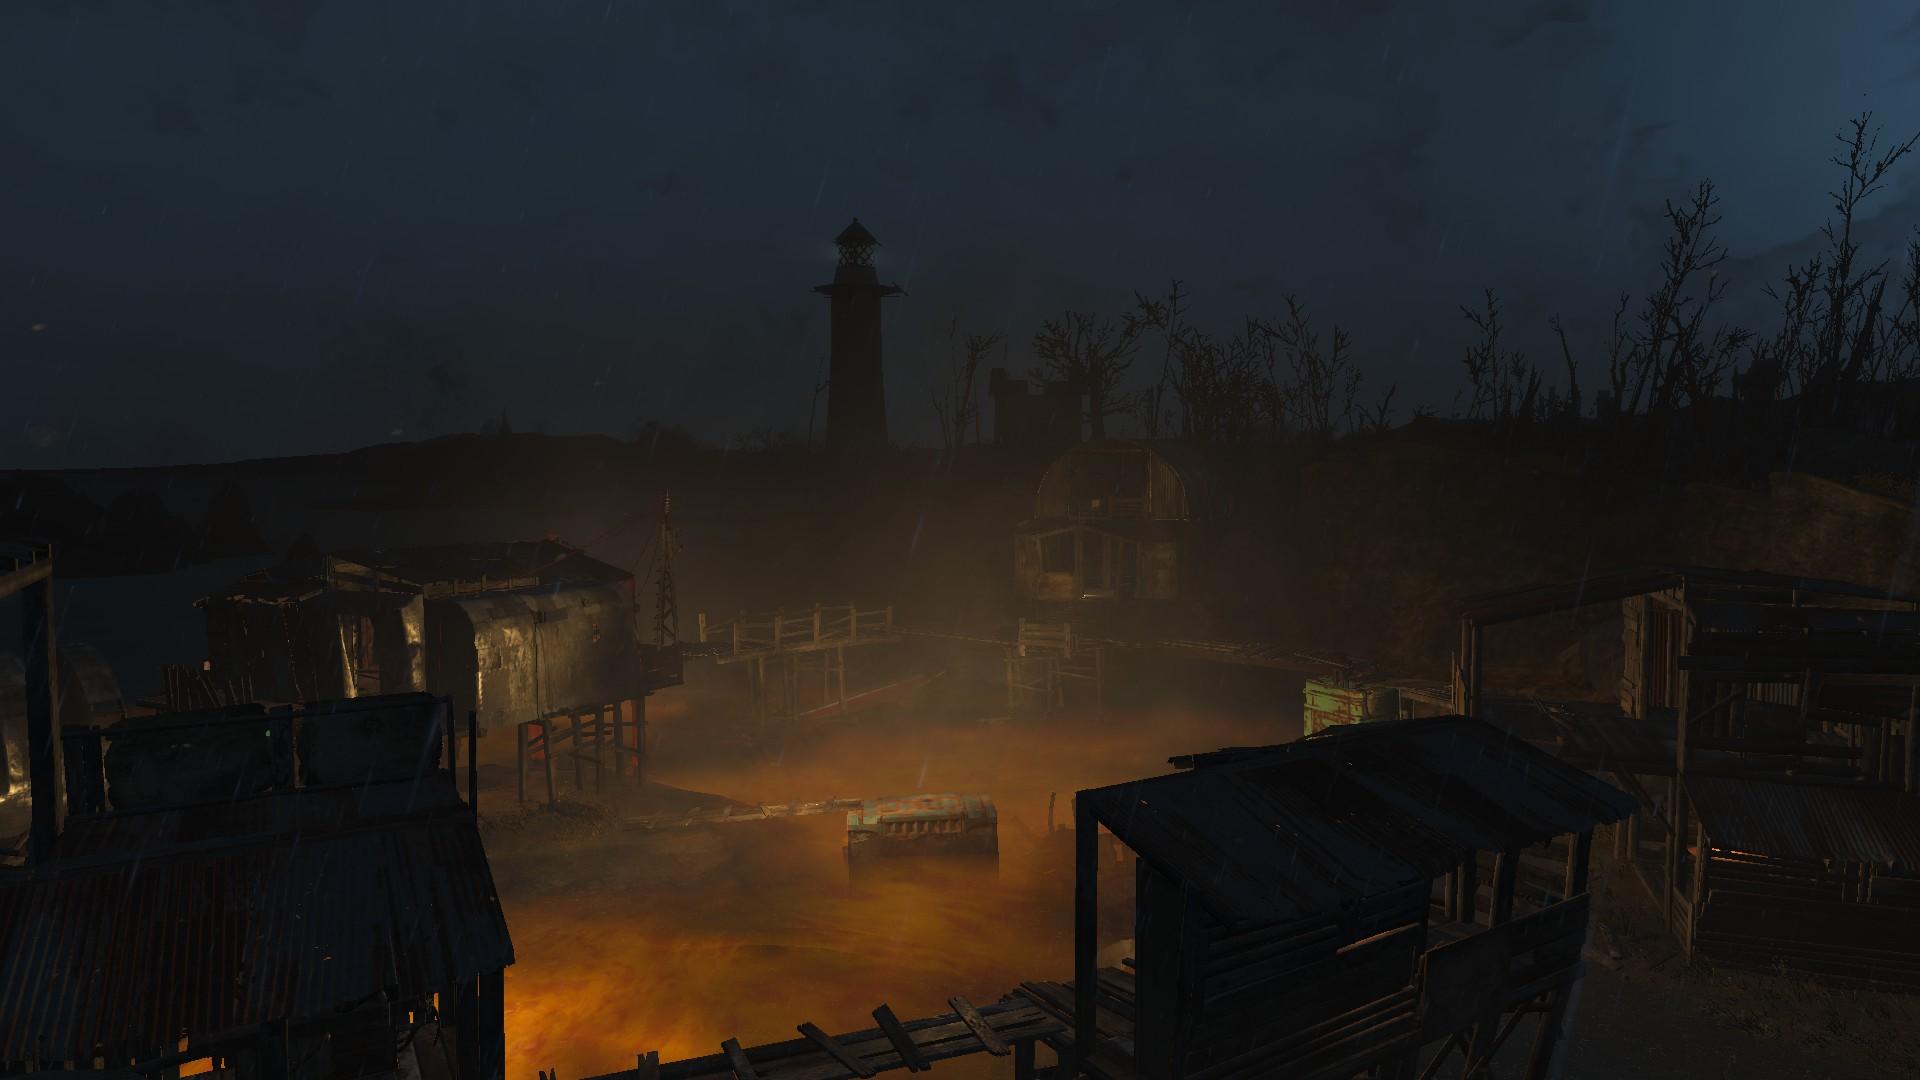 20171230235850_1.jpg - Fallout 4